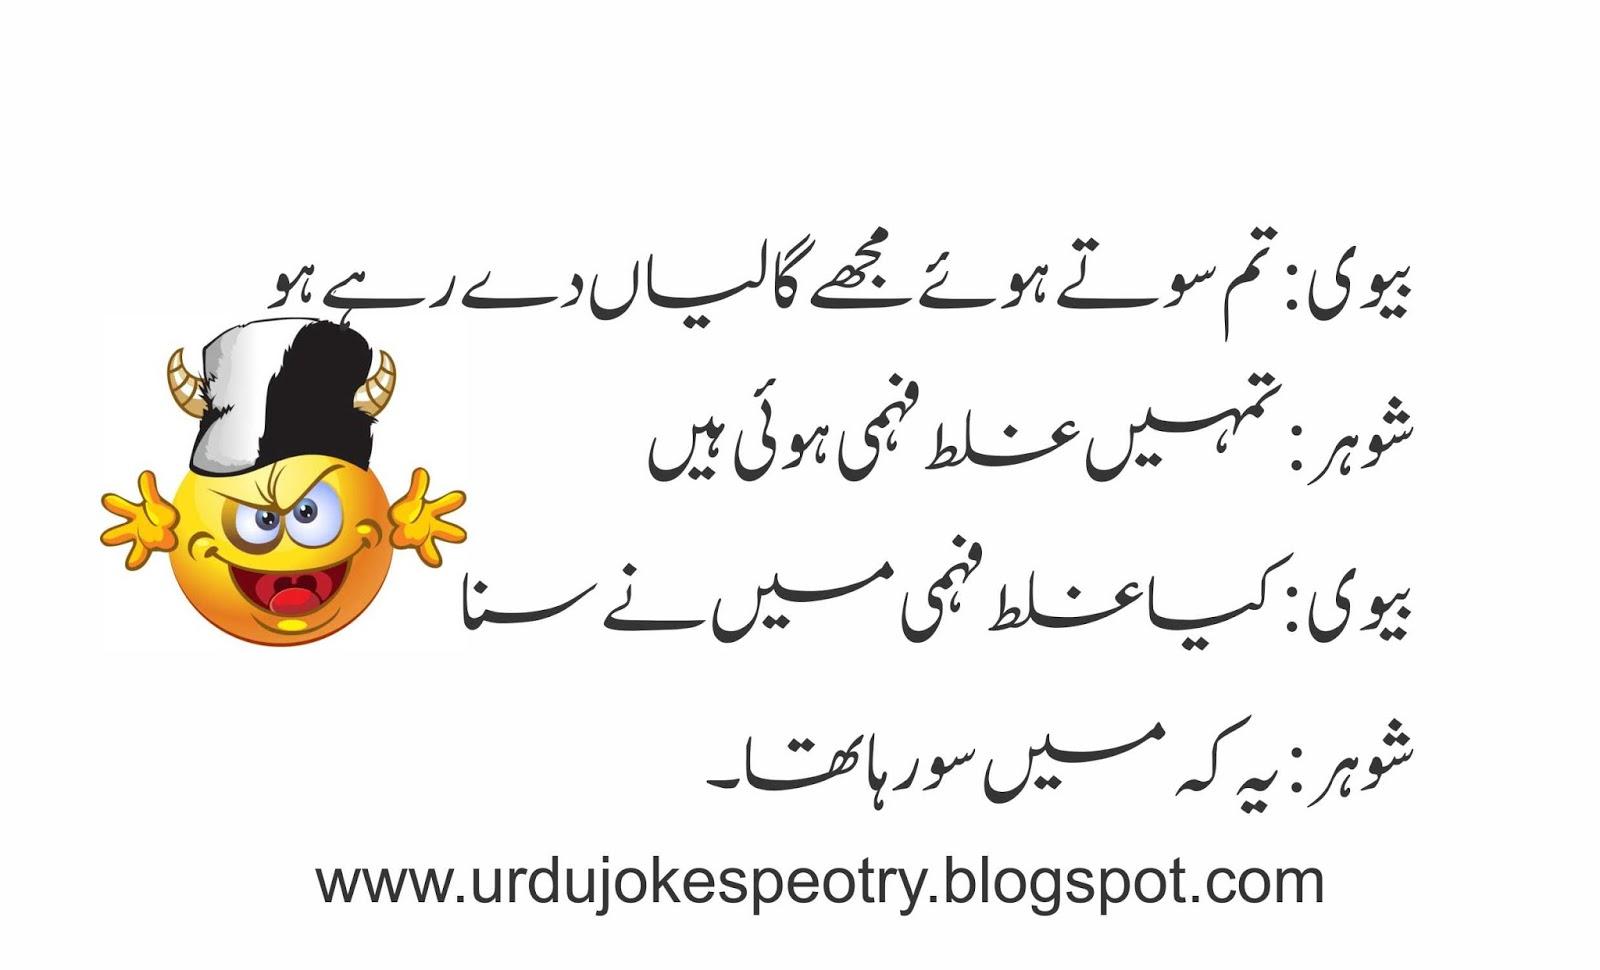 Urdu Poetry Sms   Urdu Sms , Love Sms , Poetry Sms , Funny Sms